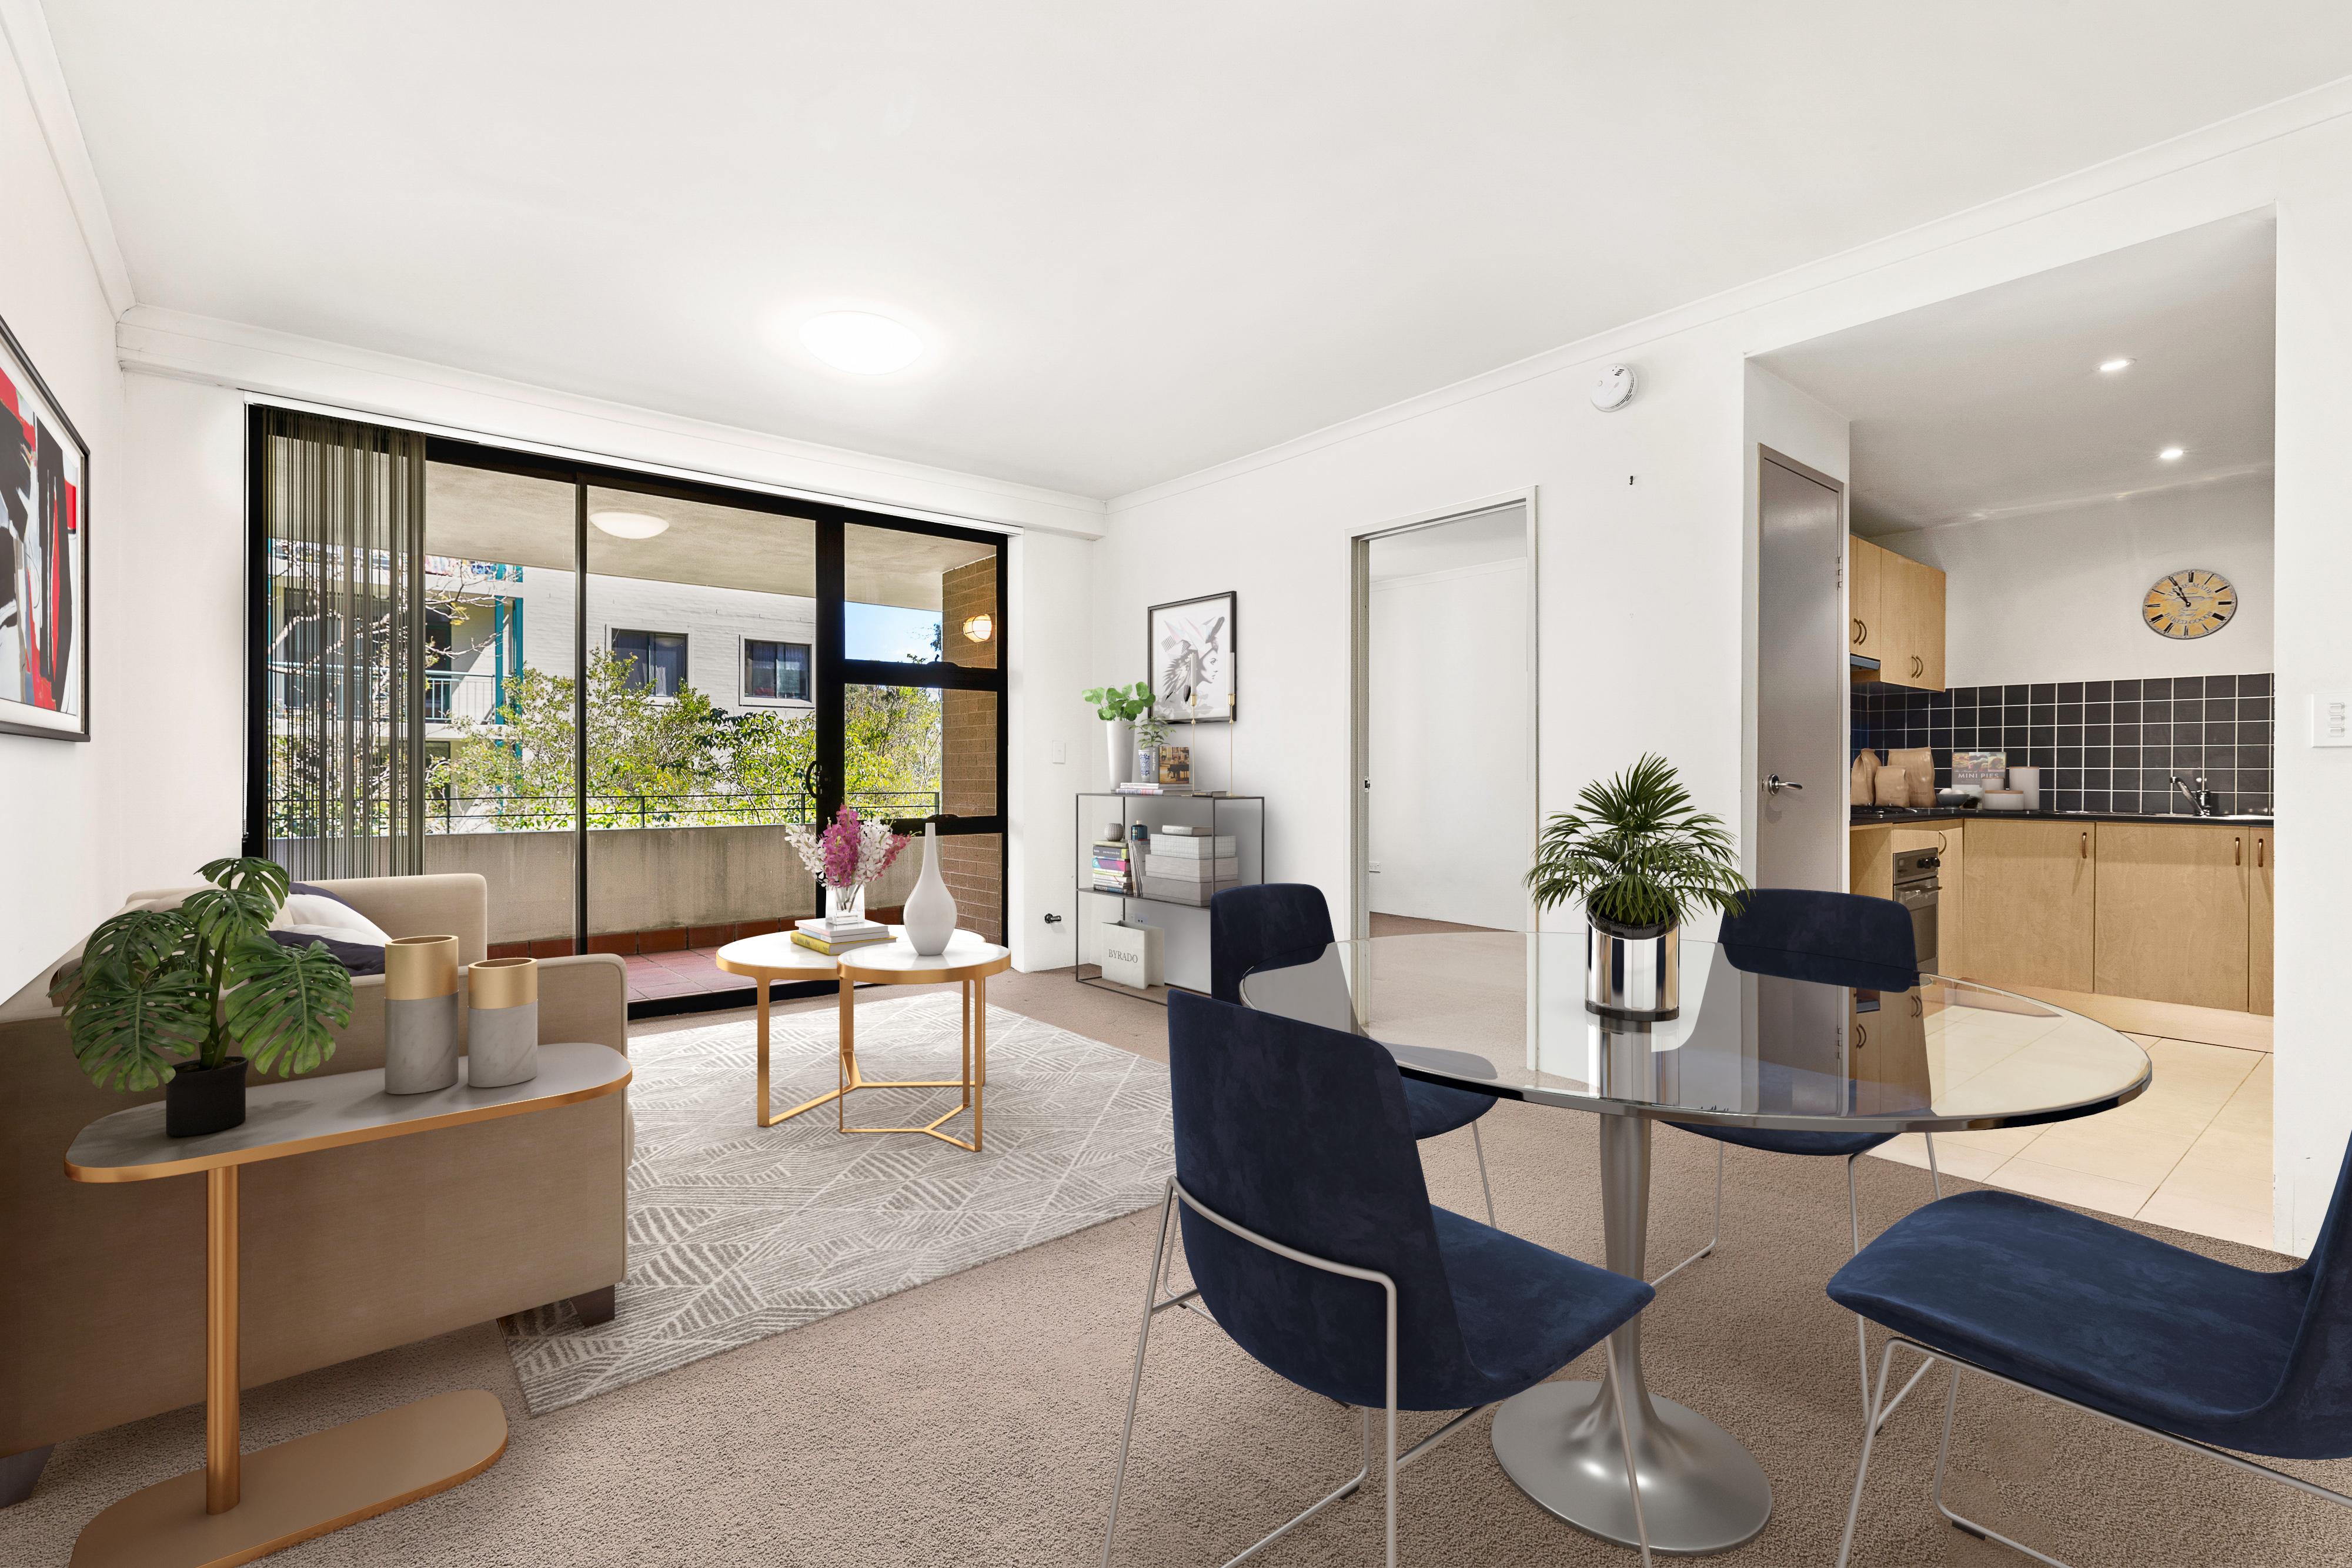 202/6-8 Freeman Road, Chatswood, NSW 2067